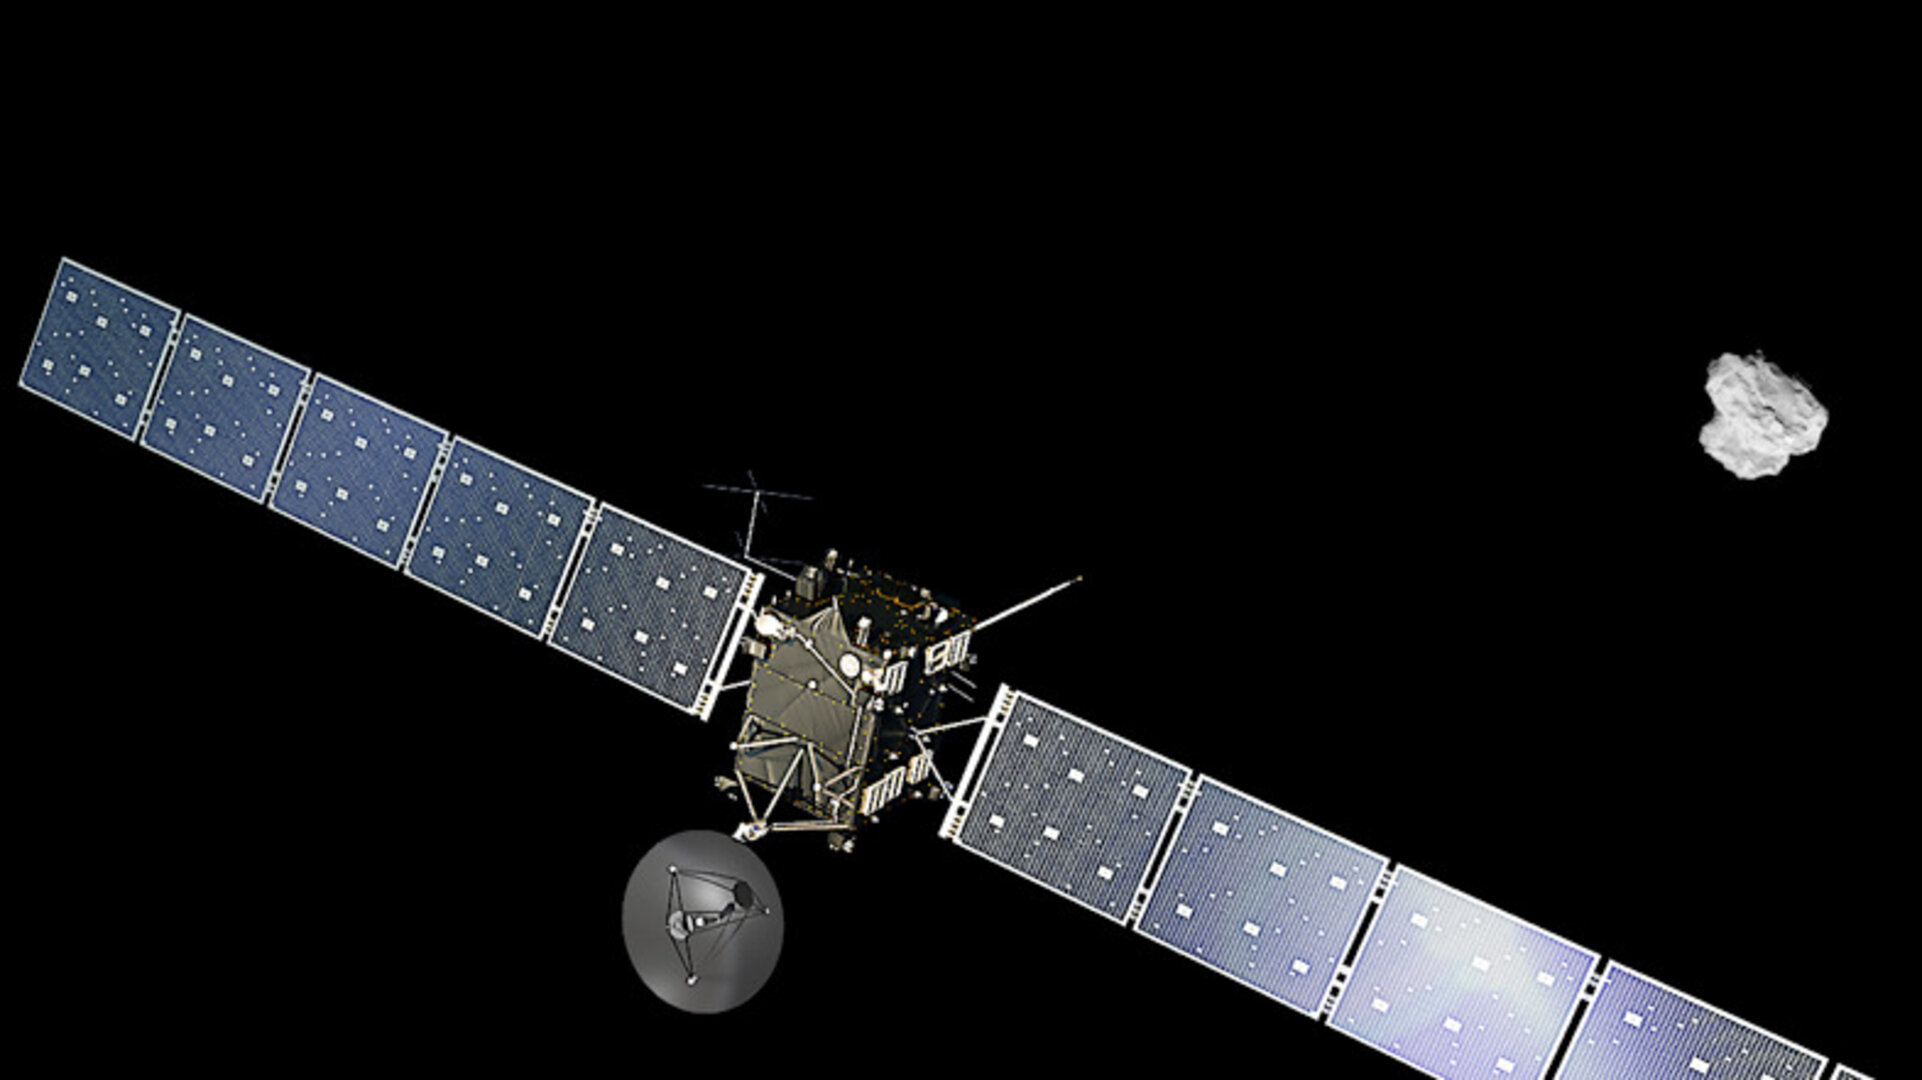 Rosetta_arrives_at_comet_pillars